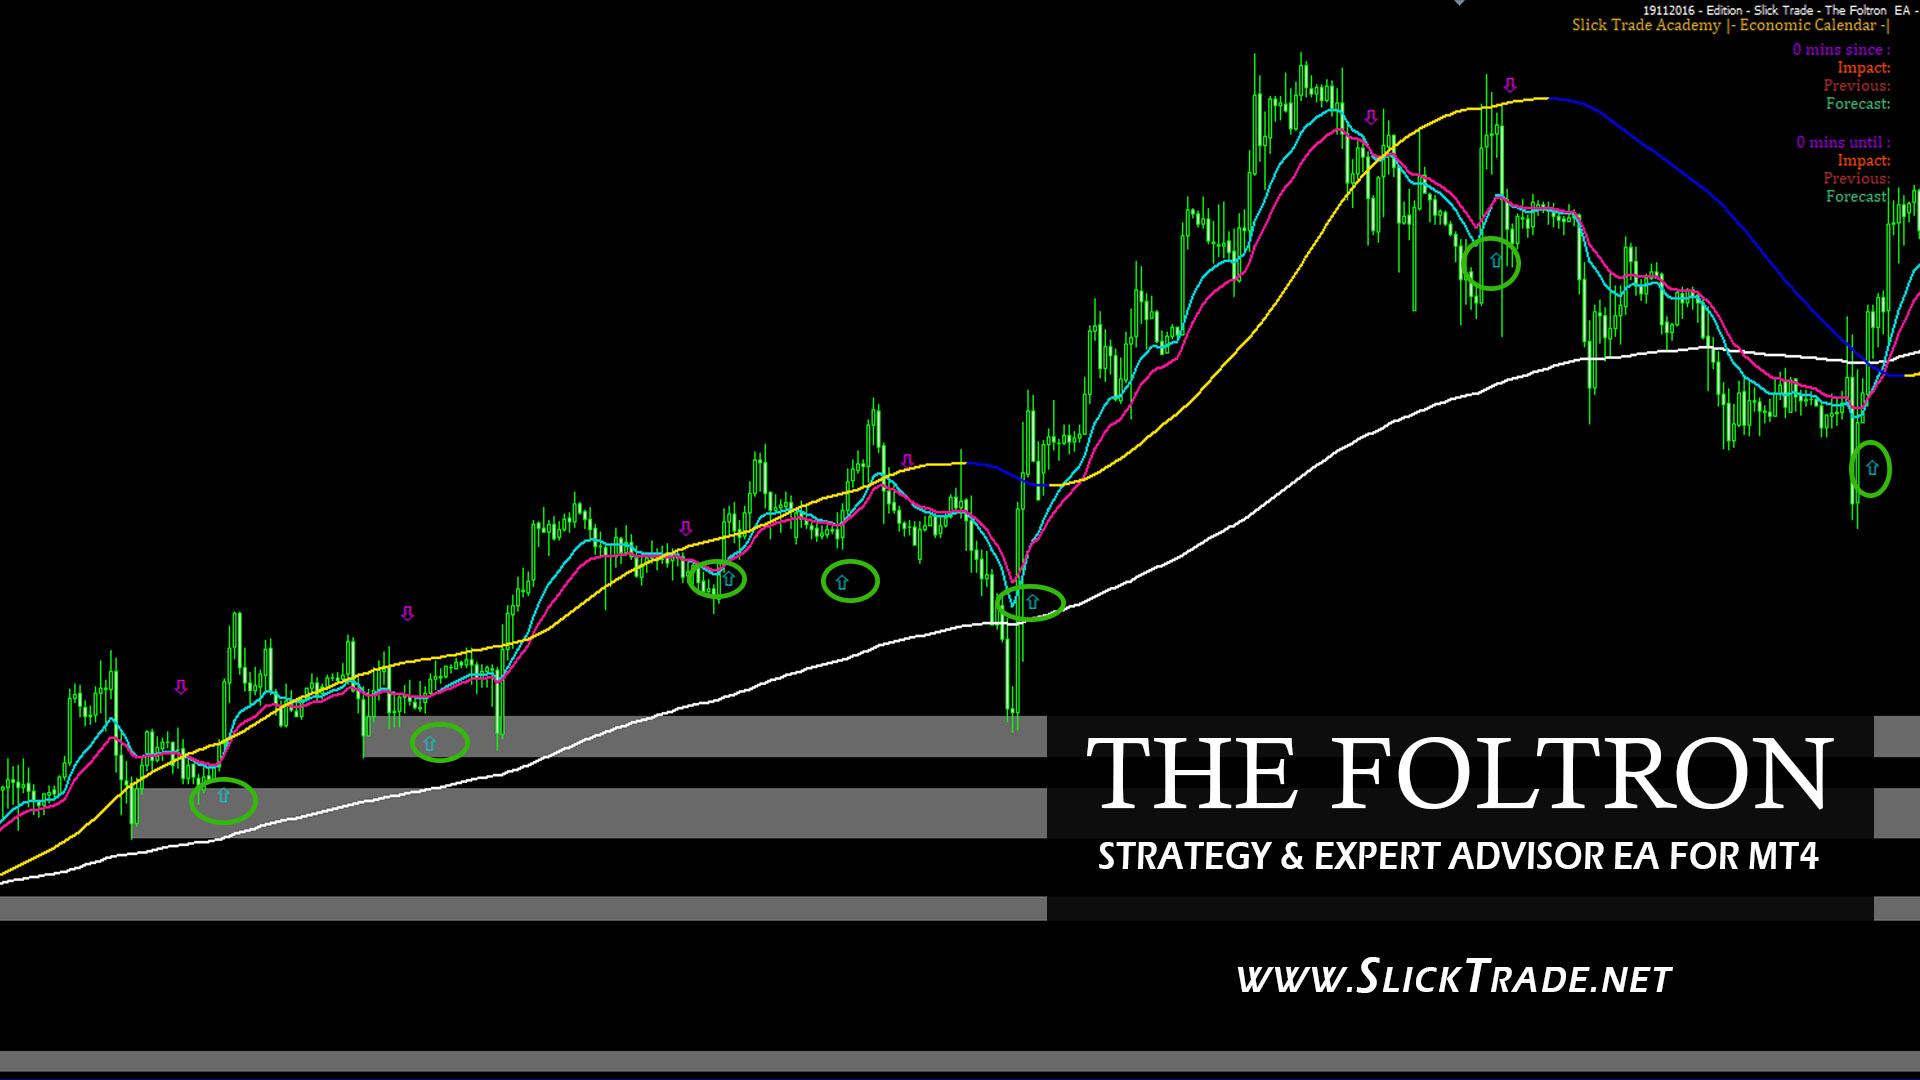 Strategy & Expert Advisor EA for MT4 foltron forex trading auto trader Strategy & Expert Advisor EA for MT4